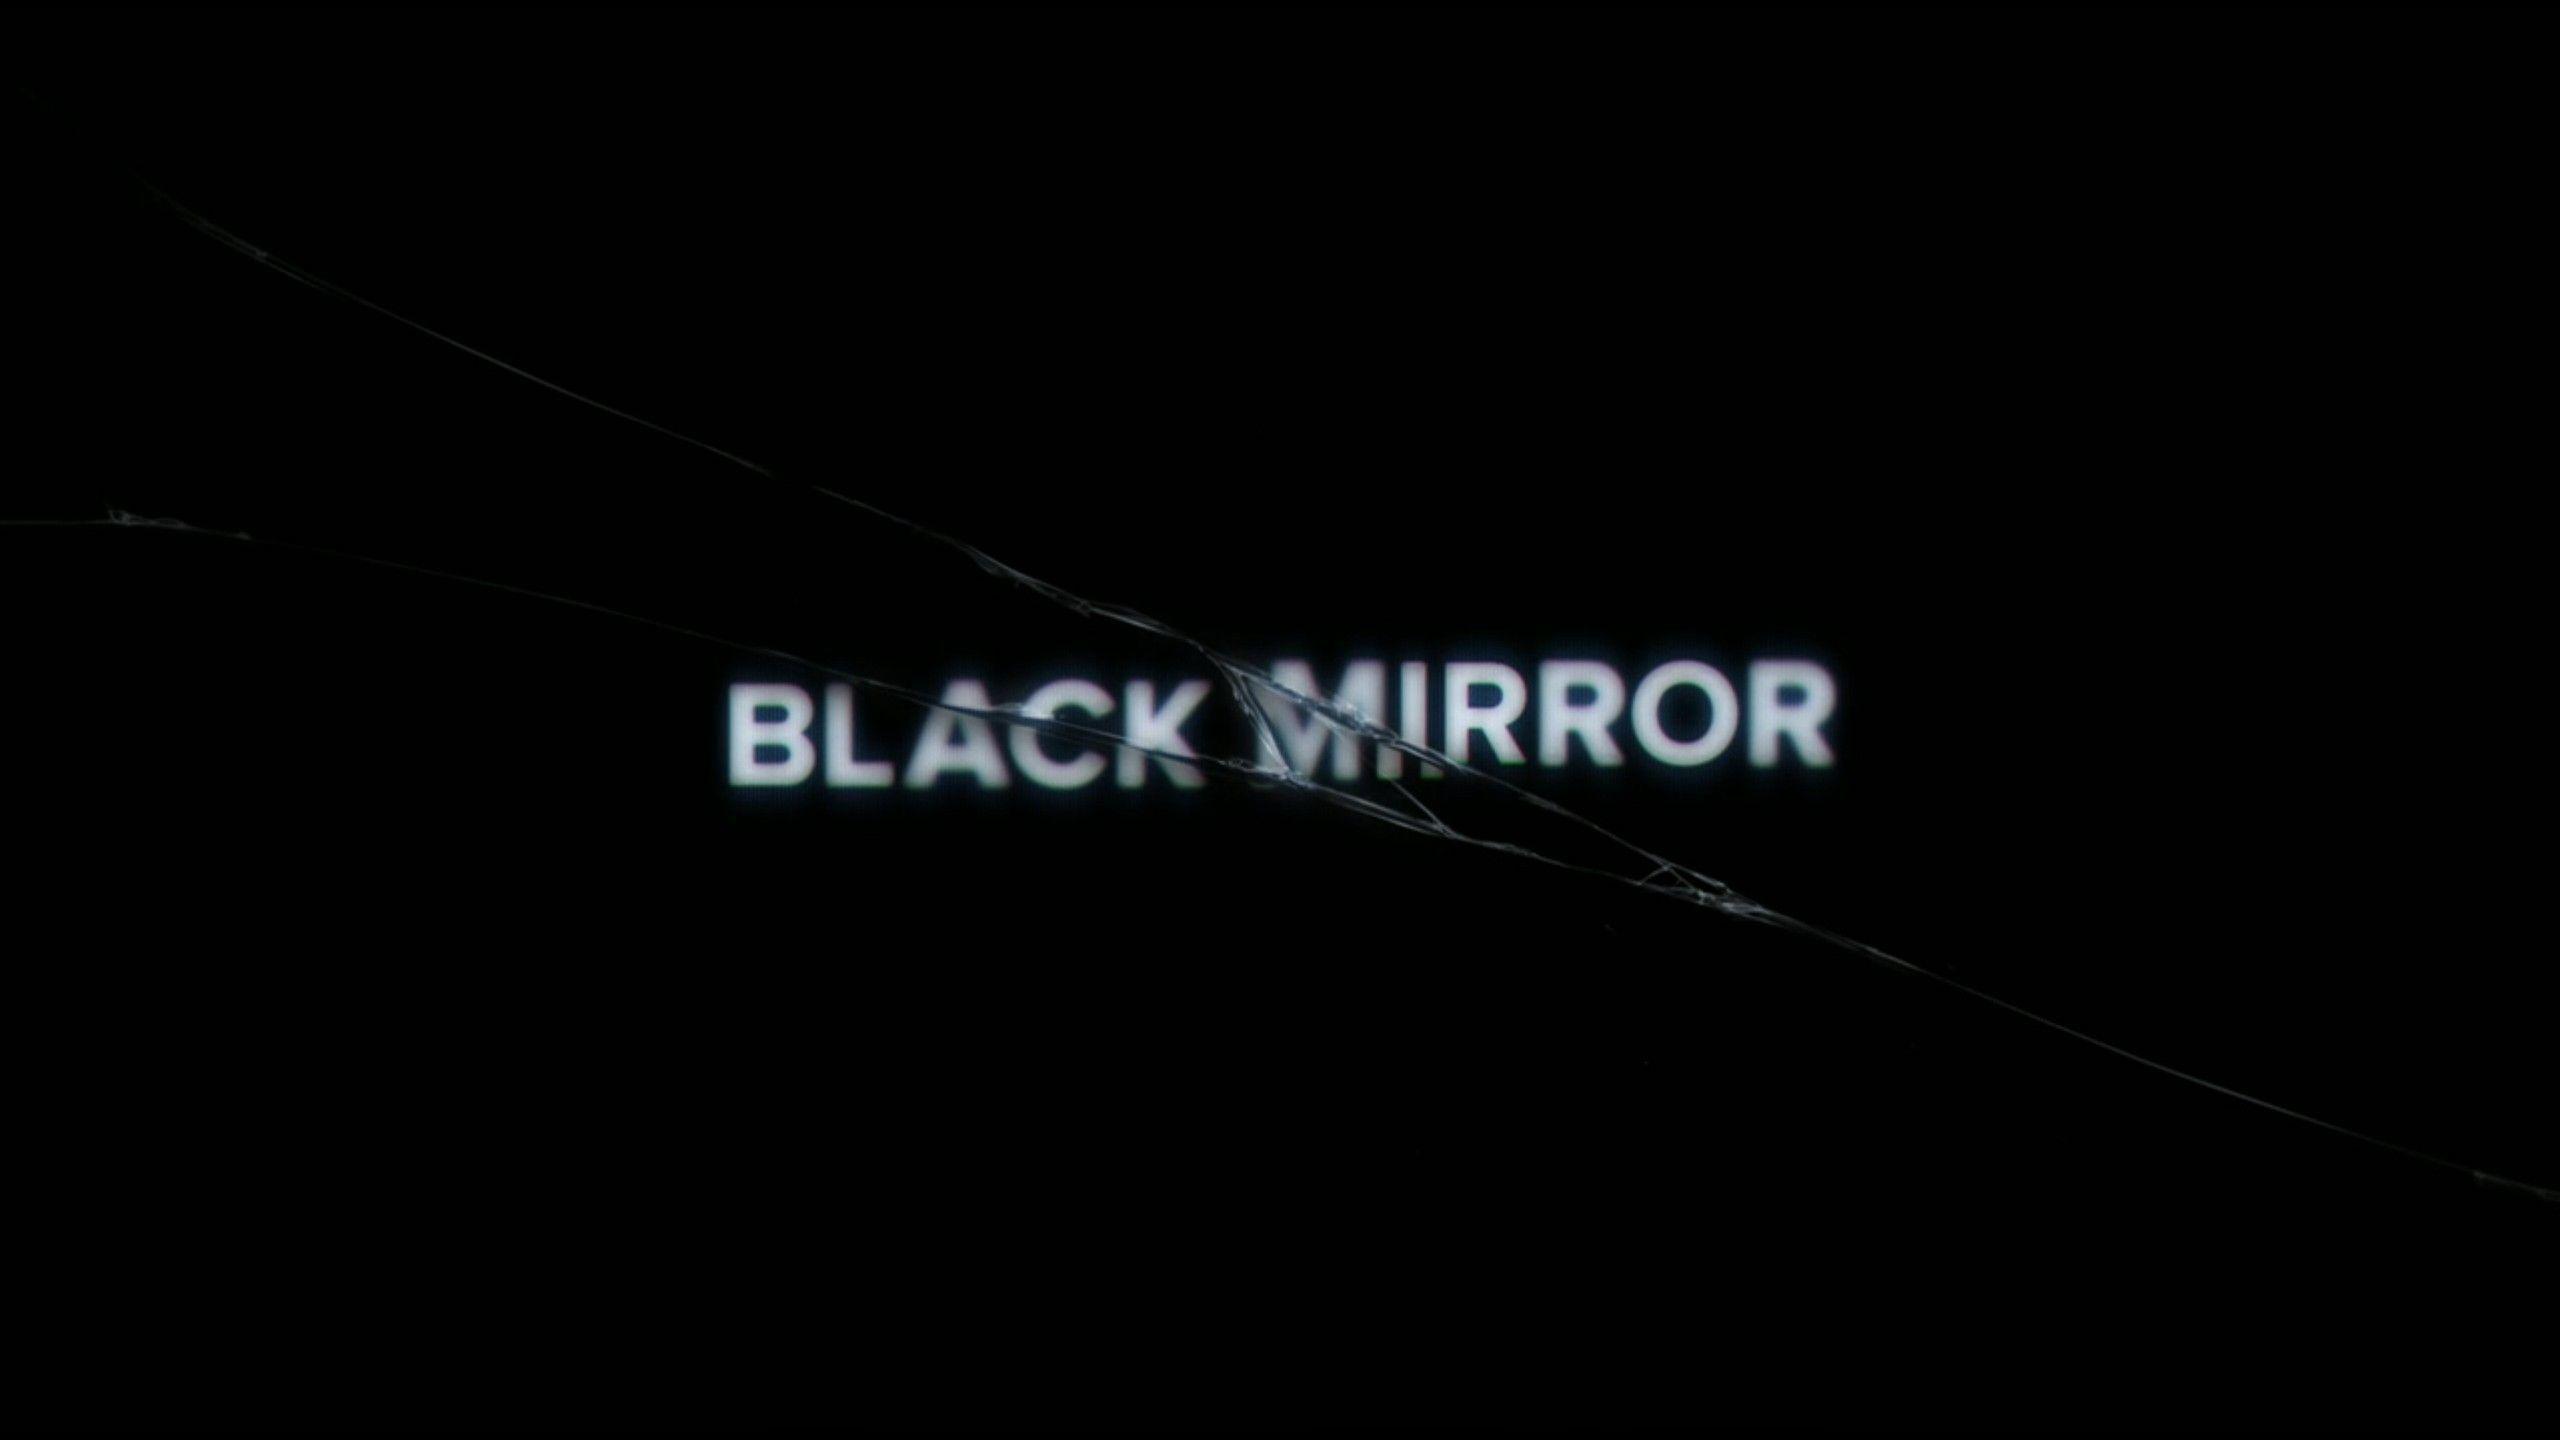 Black Mirror Season 6 Release Date Netflix & Is the Series Dropped? | Charlie Brooker